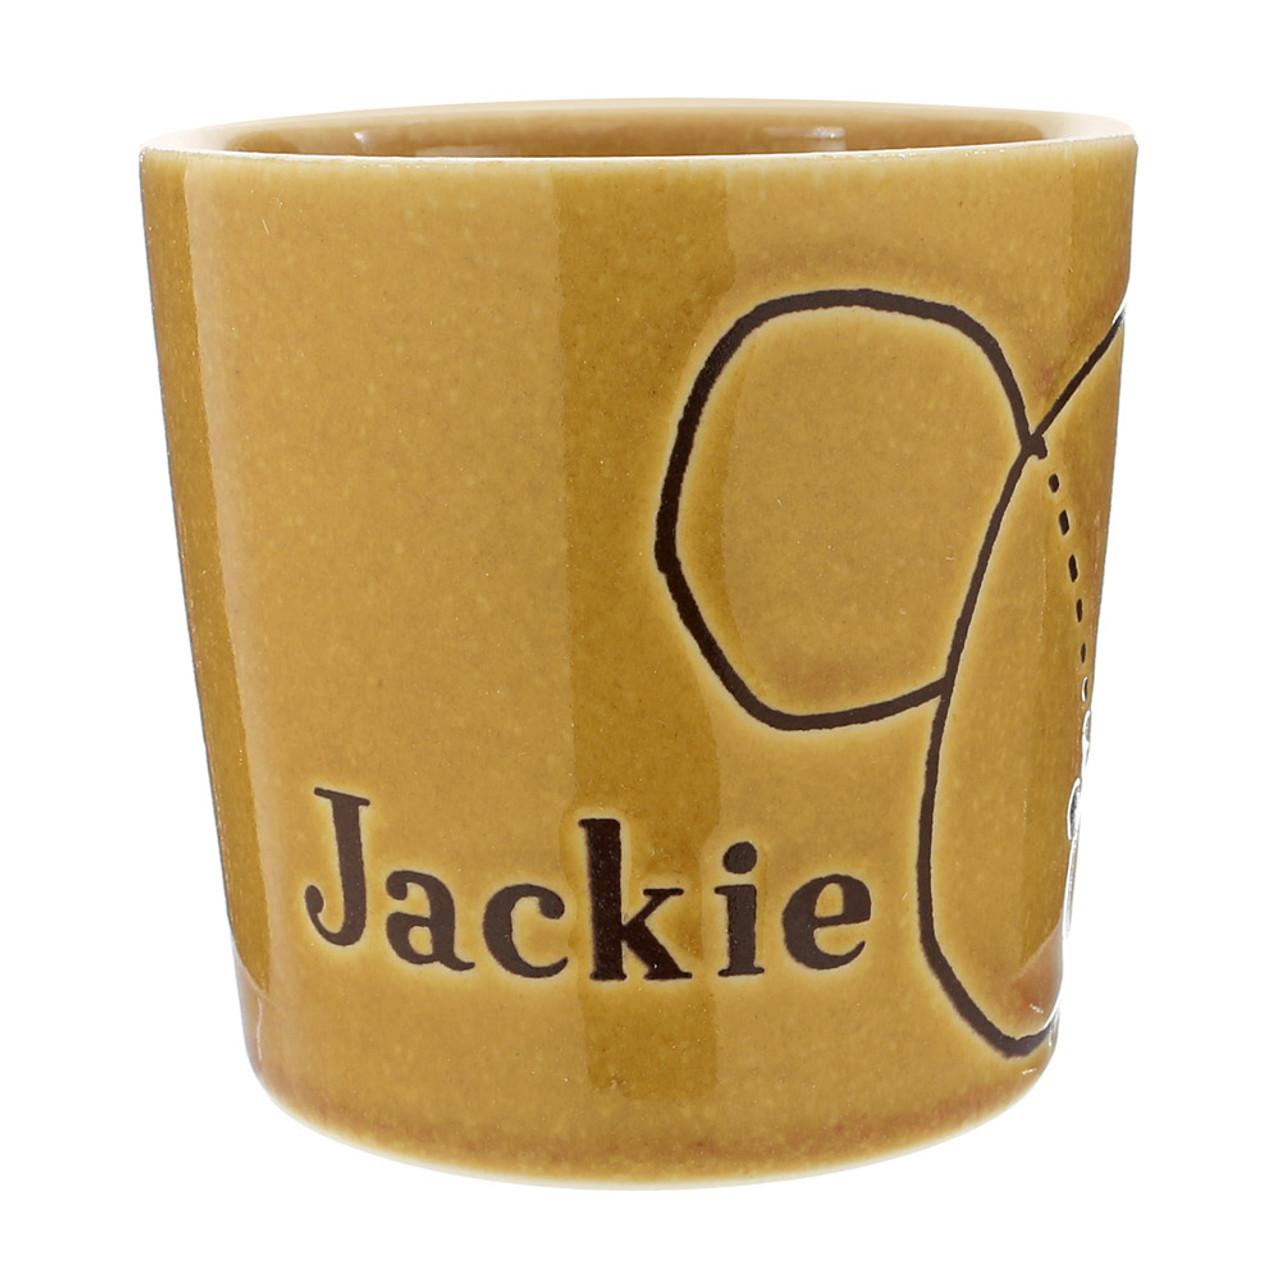 Japan The Bear School Jackie Ceramic Retro Tea Cup ( Side View )